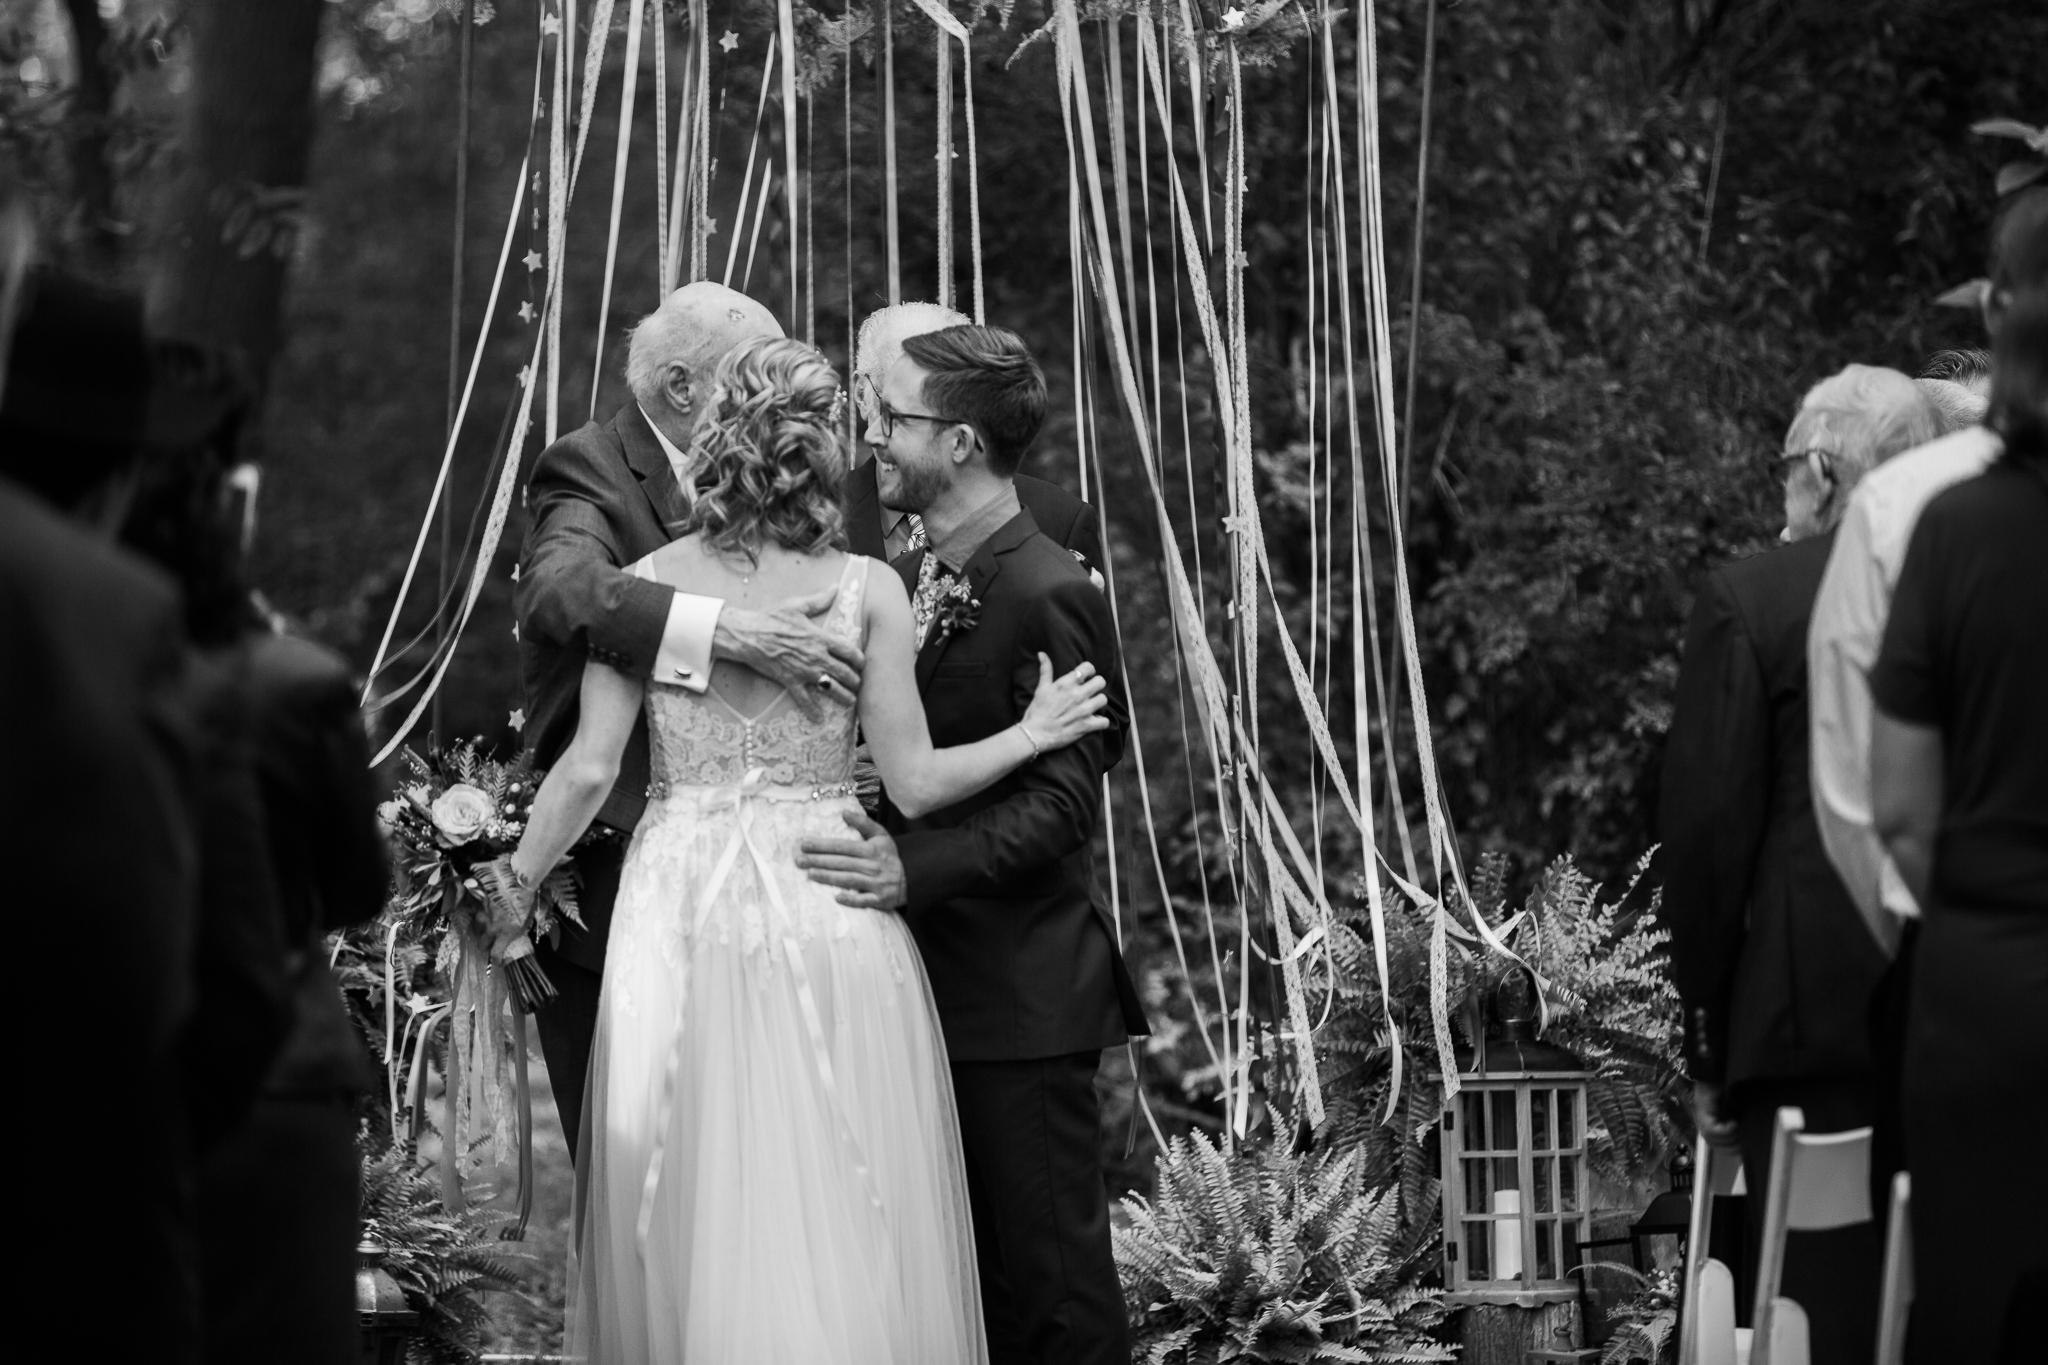 Paoli-Mill-wedding-summer-Wisconsin_086.jpg